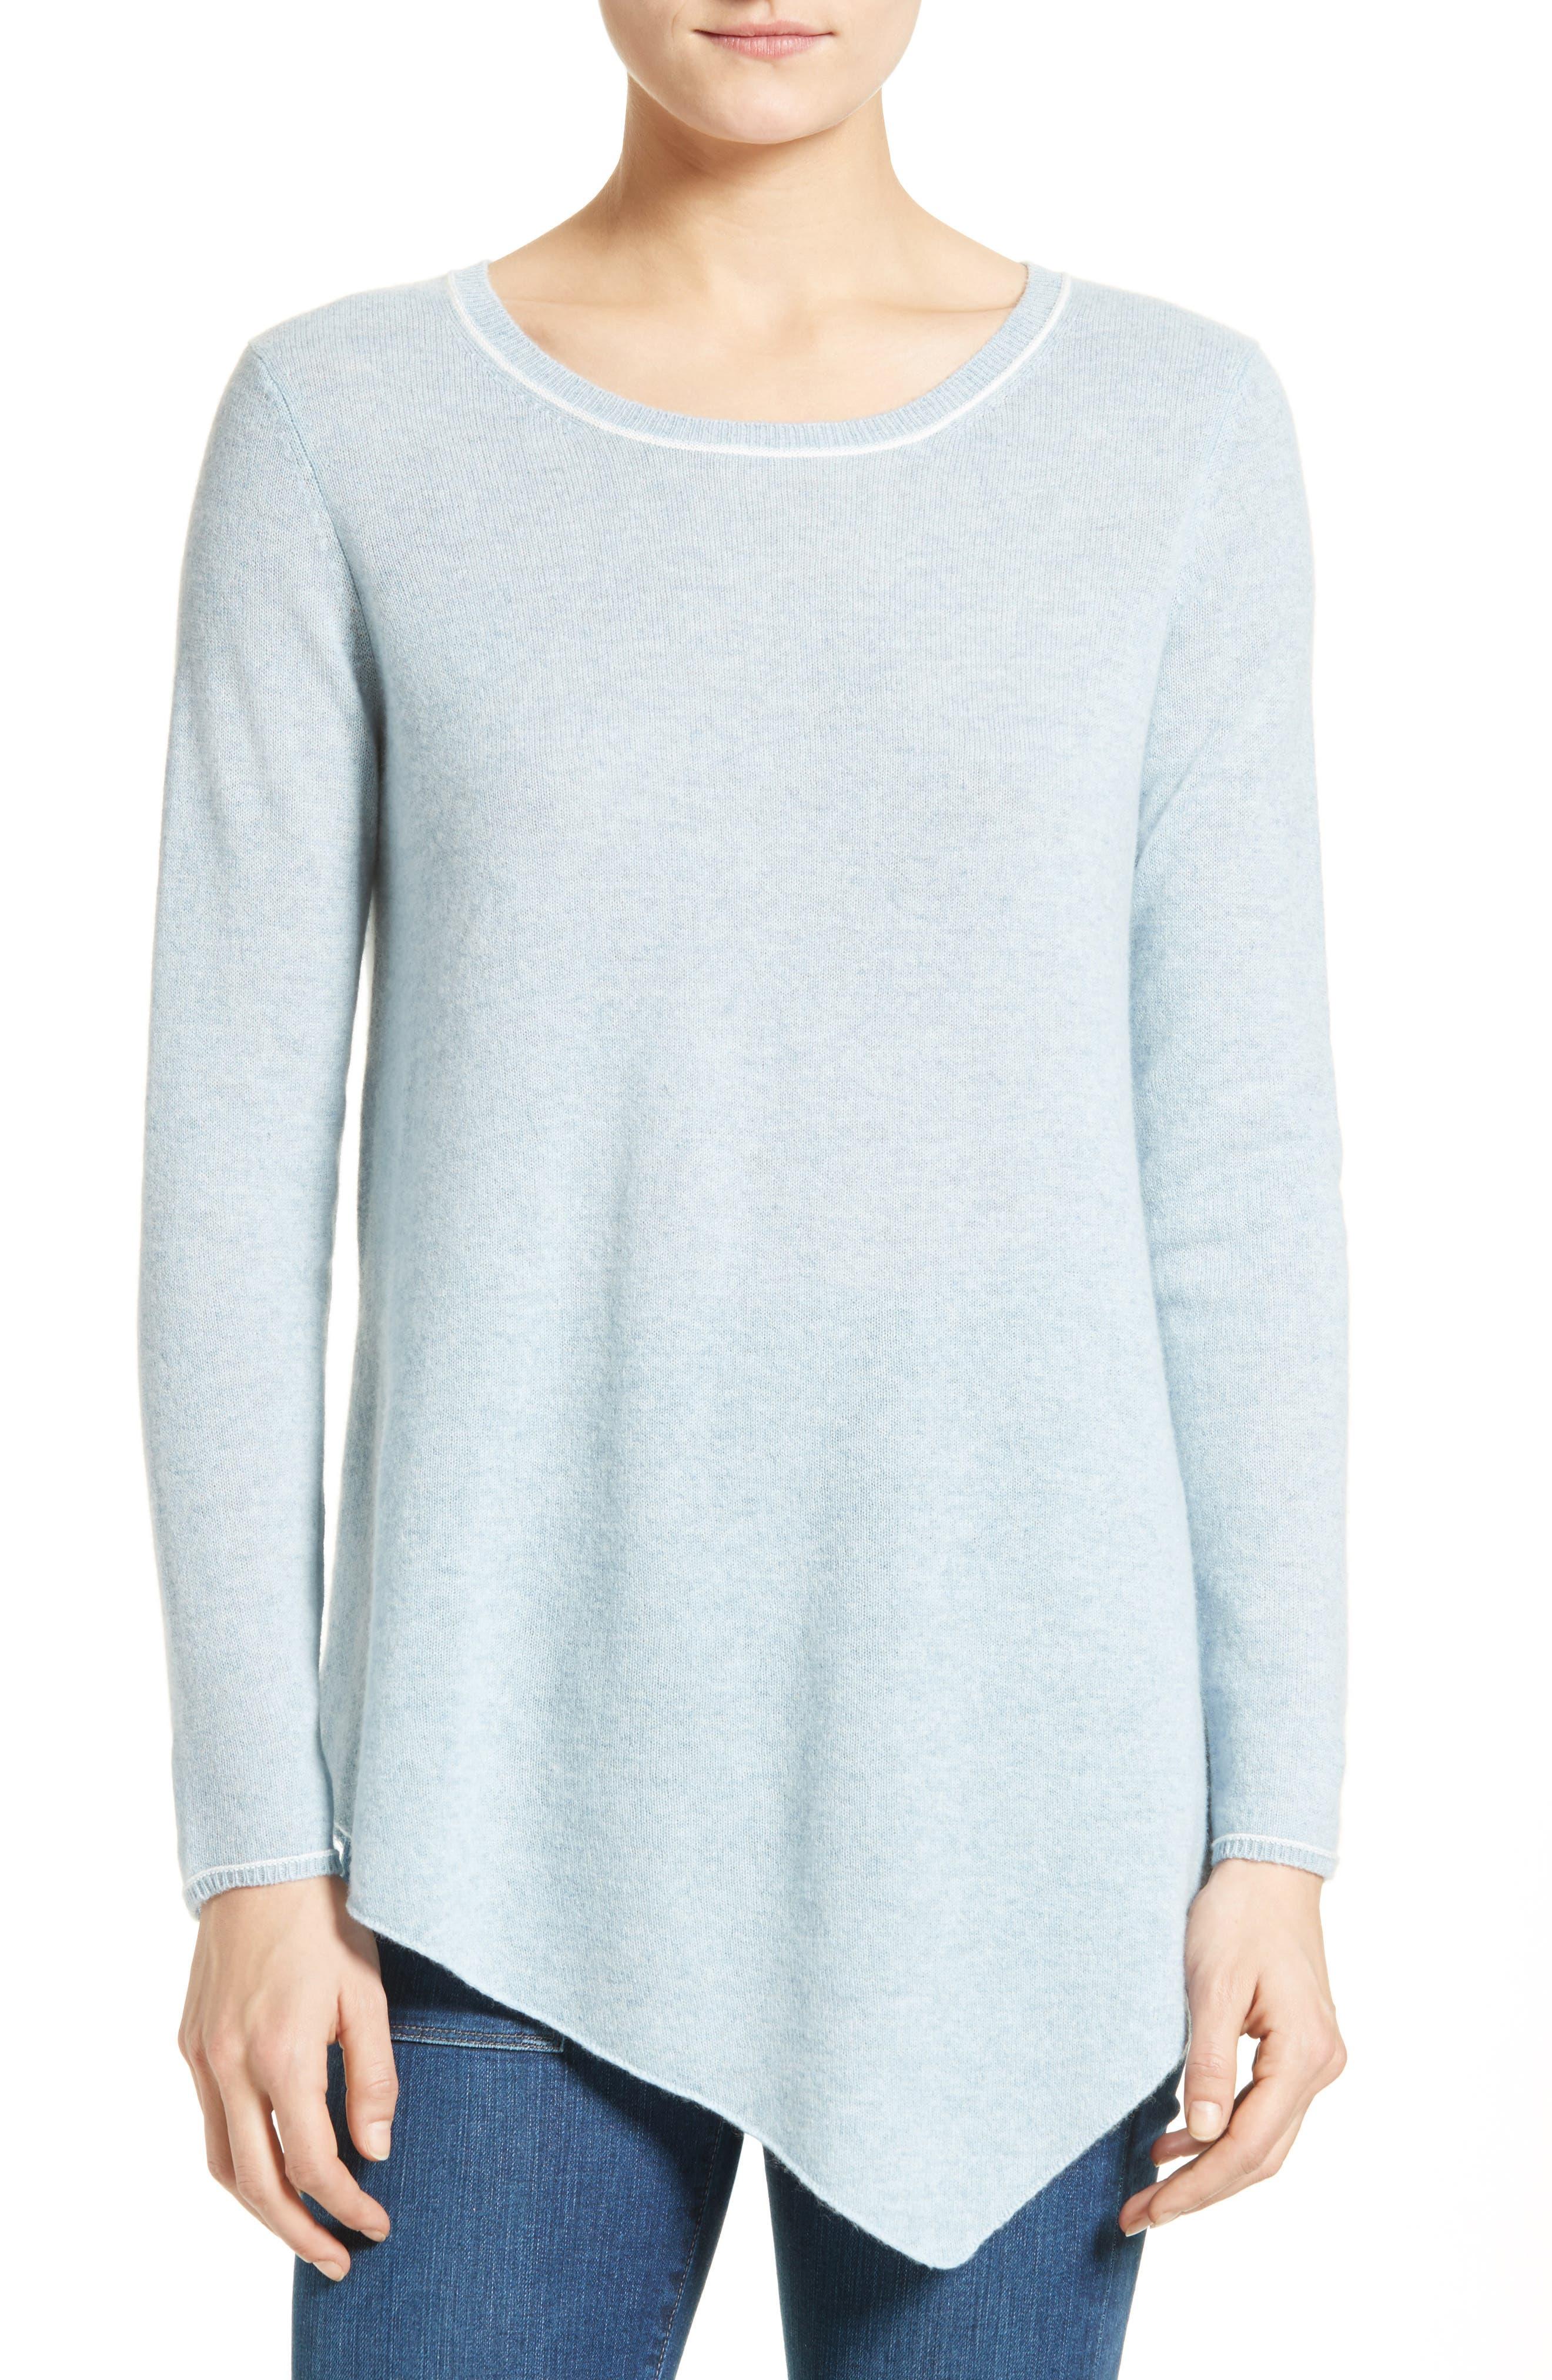 Tambrel H Asymmetrical Hem Cashmere Sweater,                         Main,                         color, 400